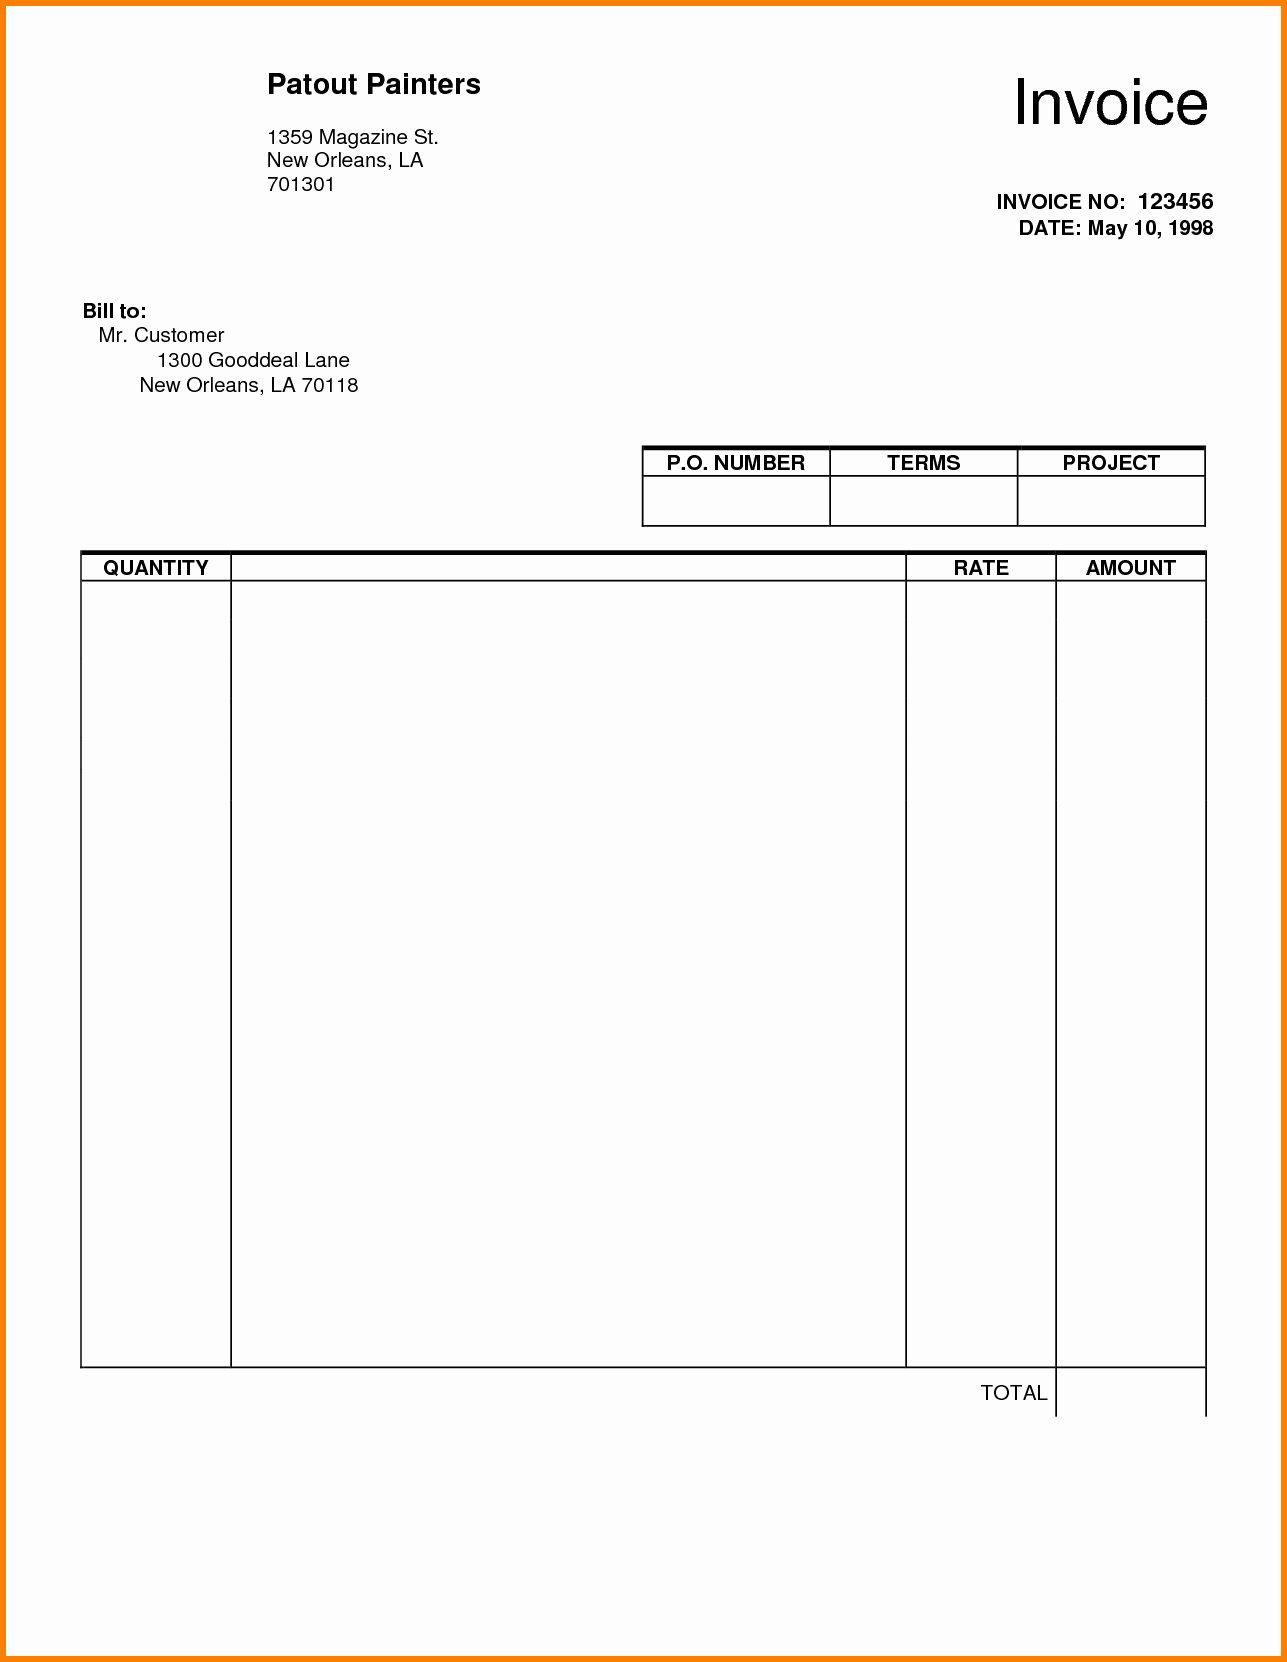 Google Docs Receipt Template Lovely Blank Invoice Pdf Invoice Template Word Invoice Template Receipt Template